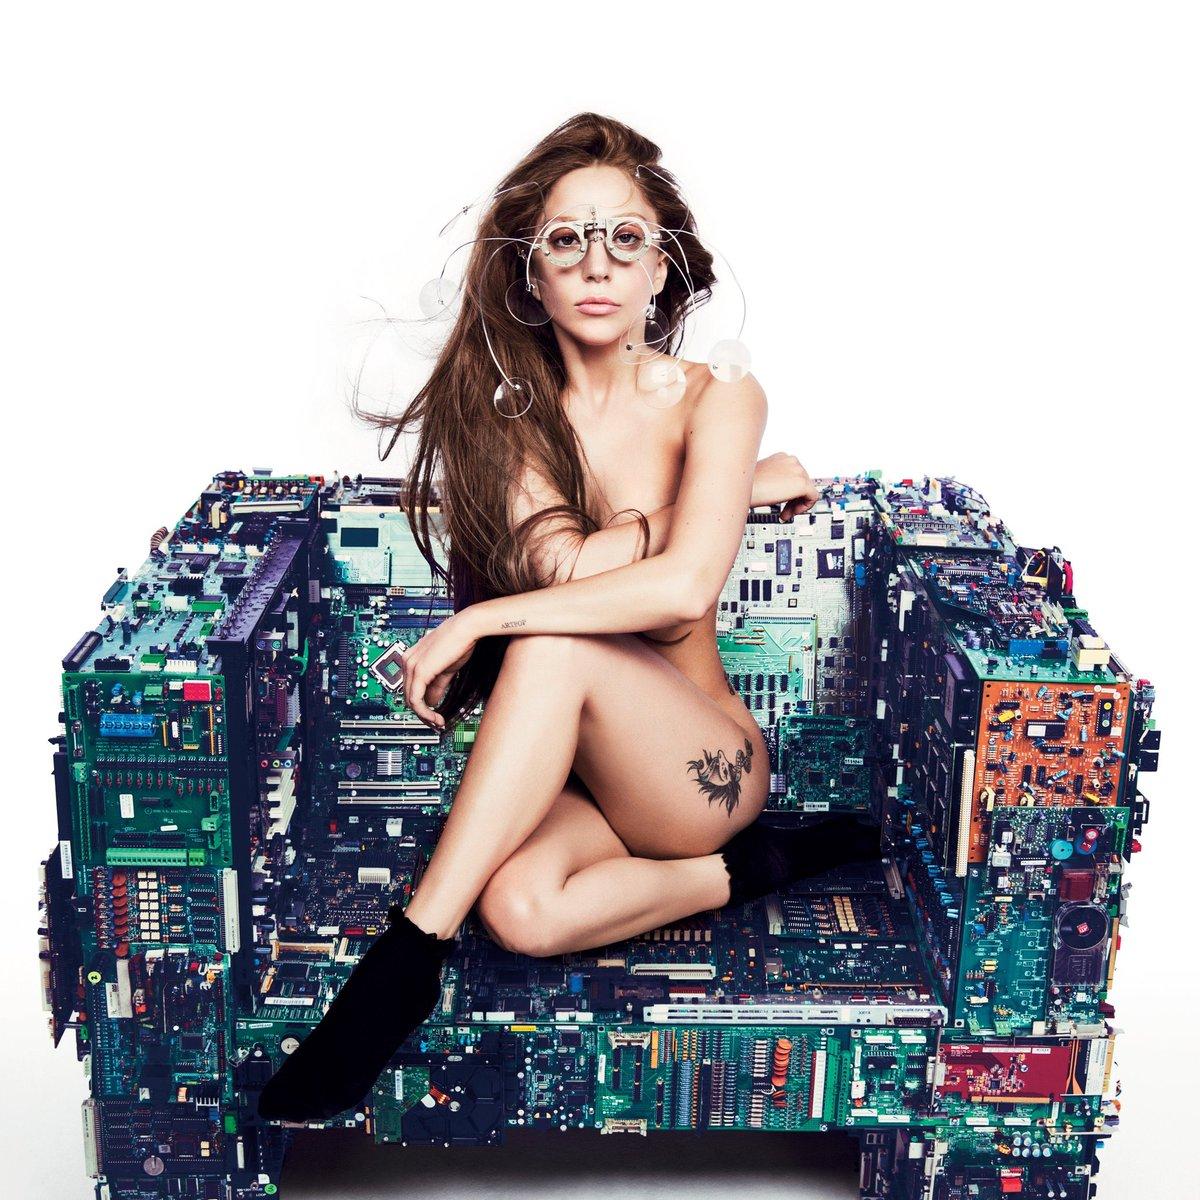 The mistreatment of Lady Gaga during the ARTPOP era; a thread. #justiceforARTPOP